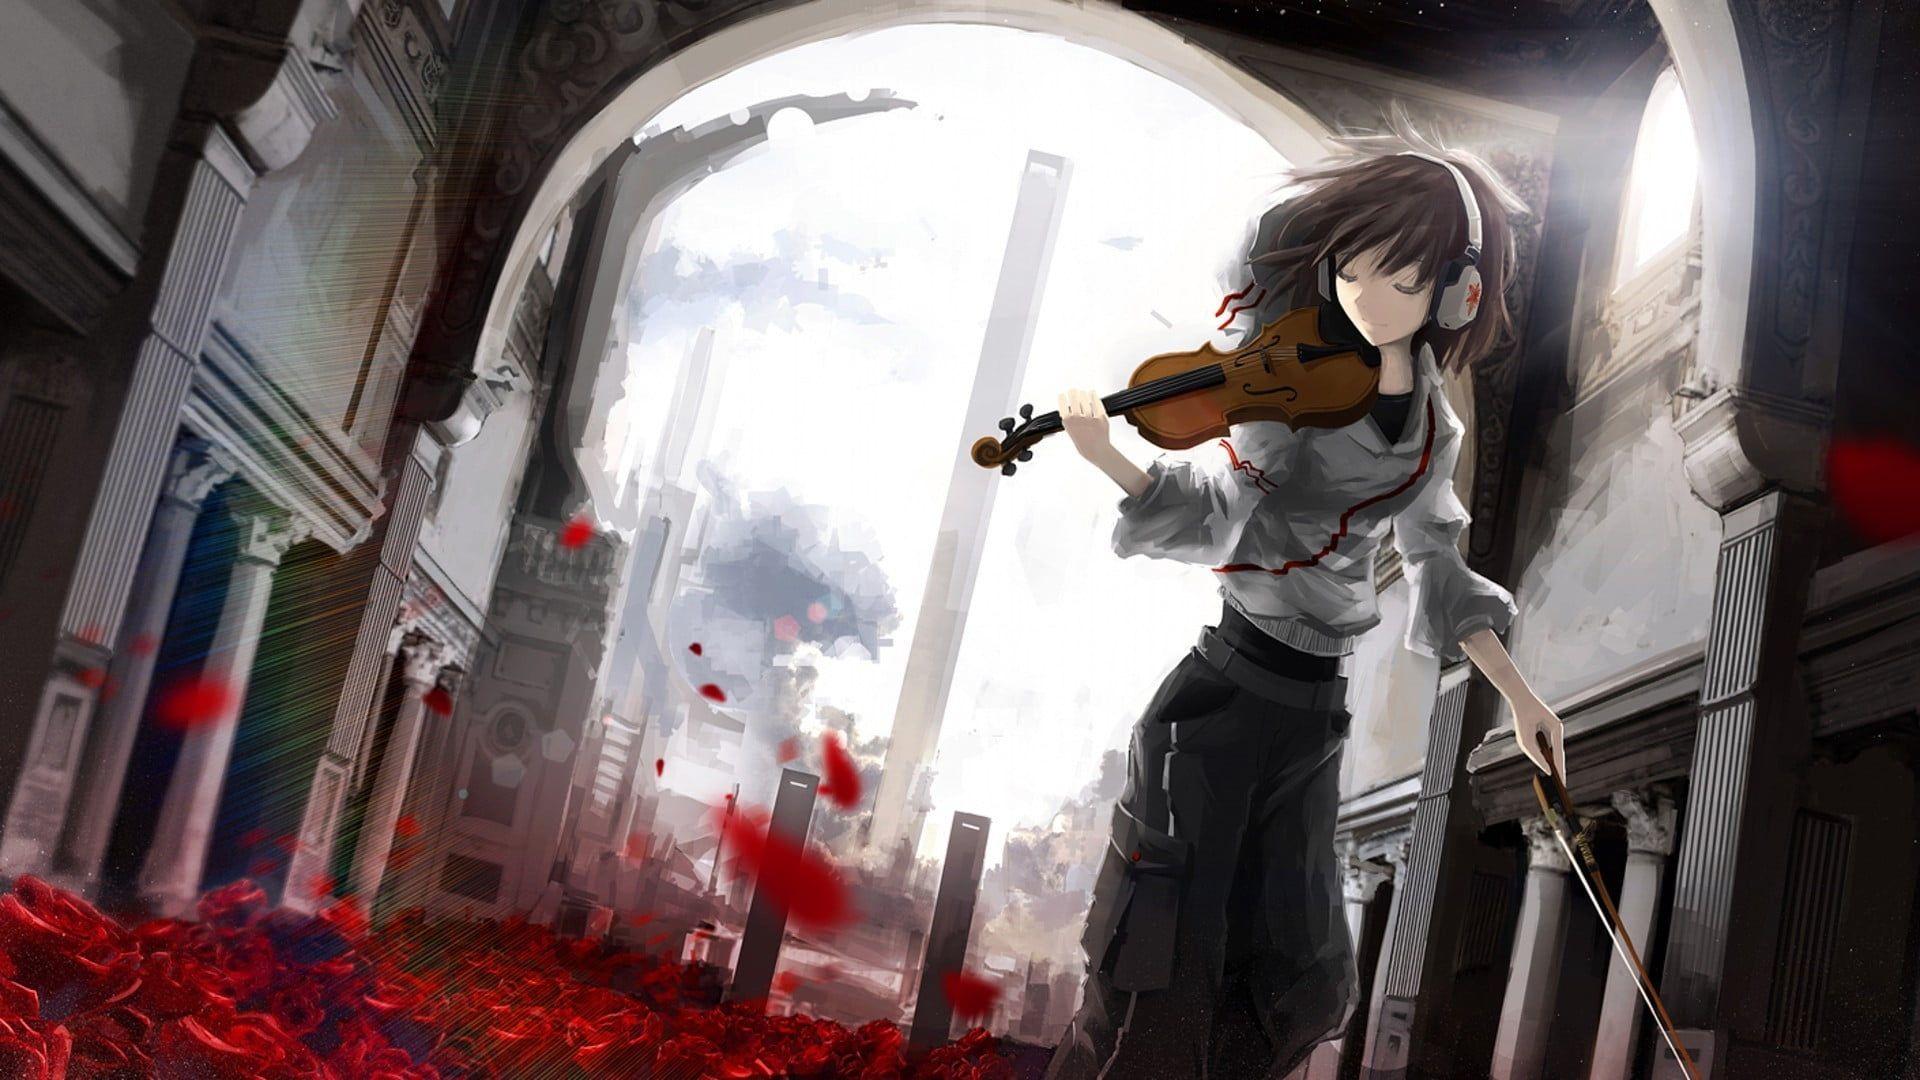 Girl Playing Violin Anime Illustration Animated Character Holding Violin Wallpaper Anime Violin Headphones Rose Leaves Building A Animasi Gambar Klasik